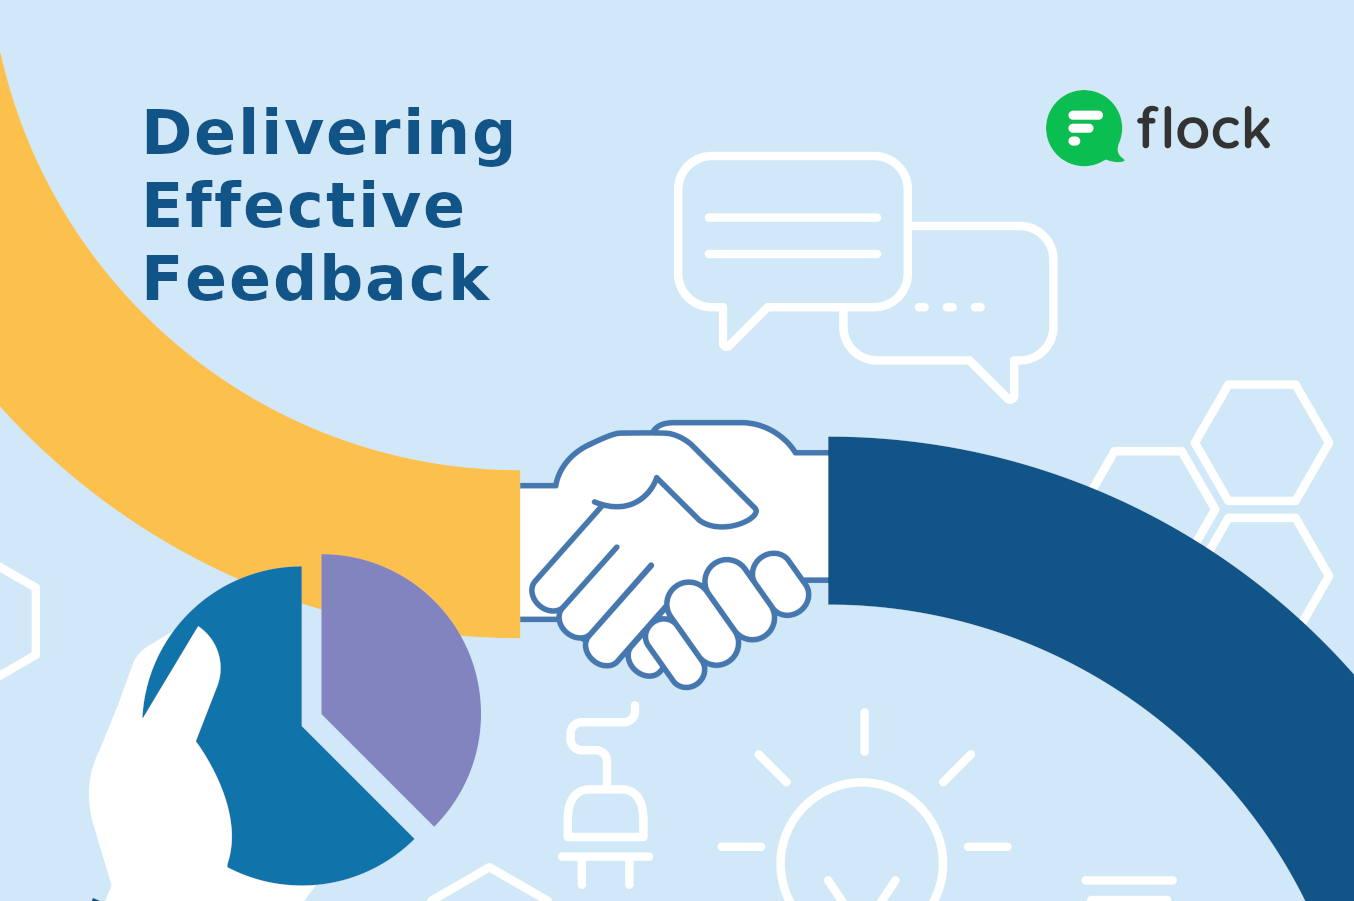 Delivering Effective Feedback